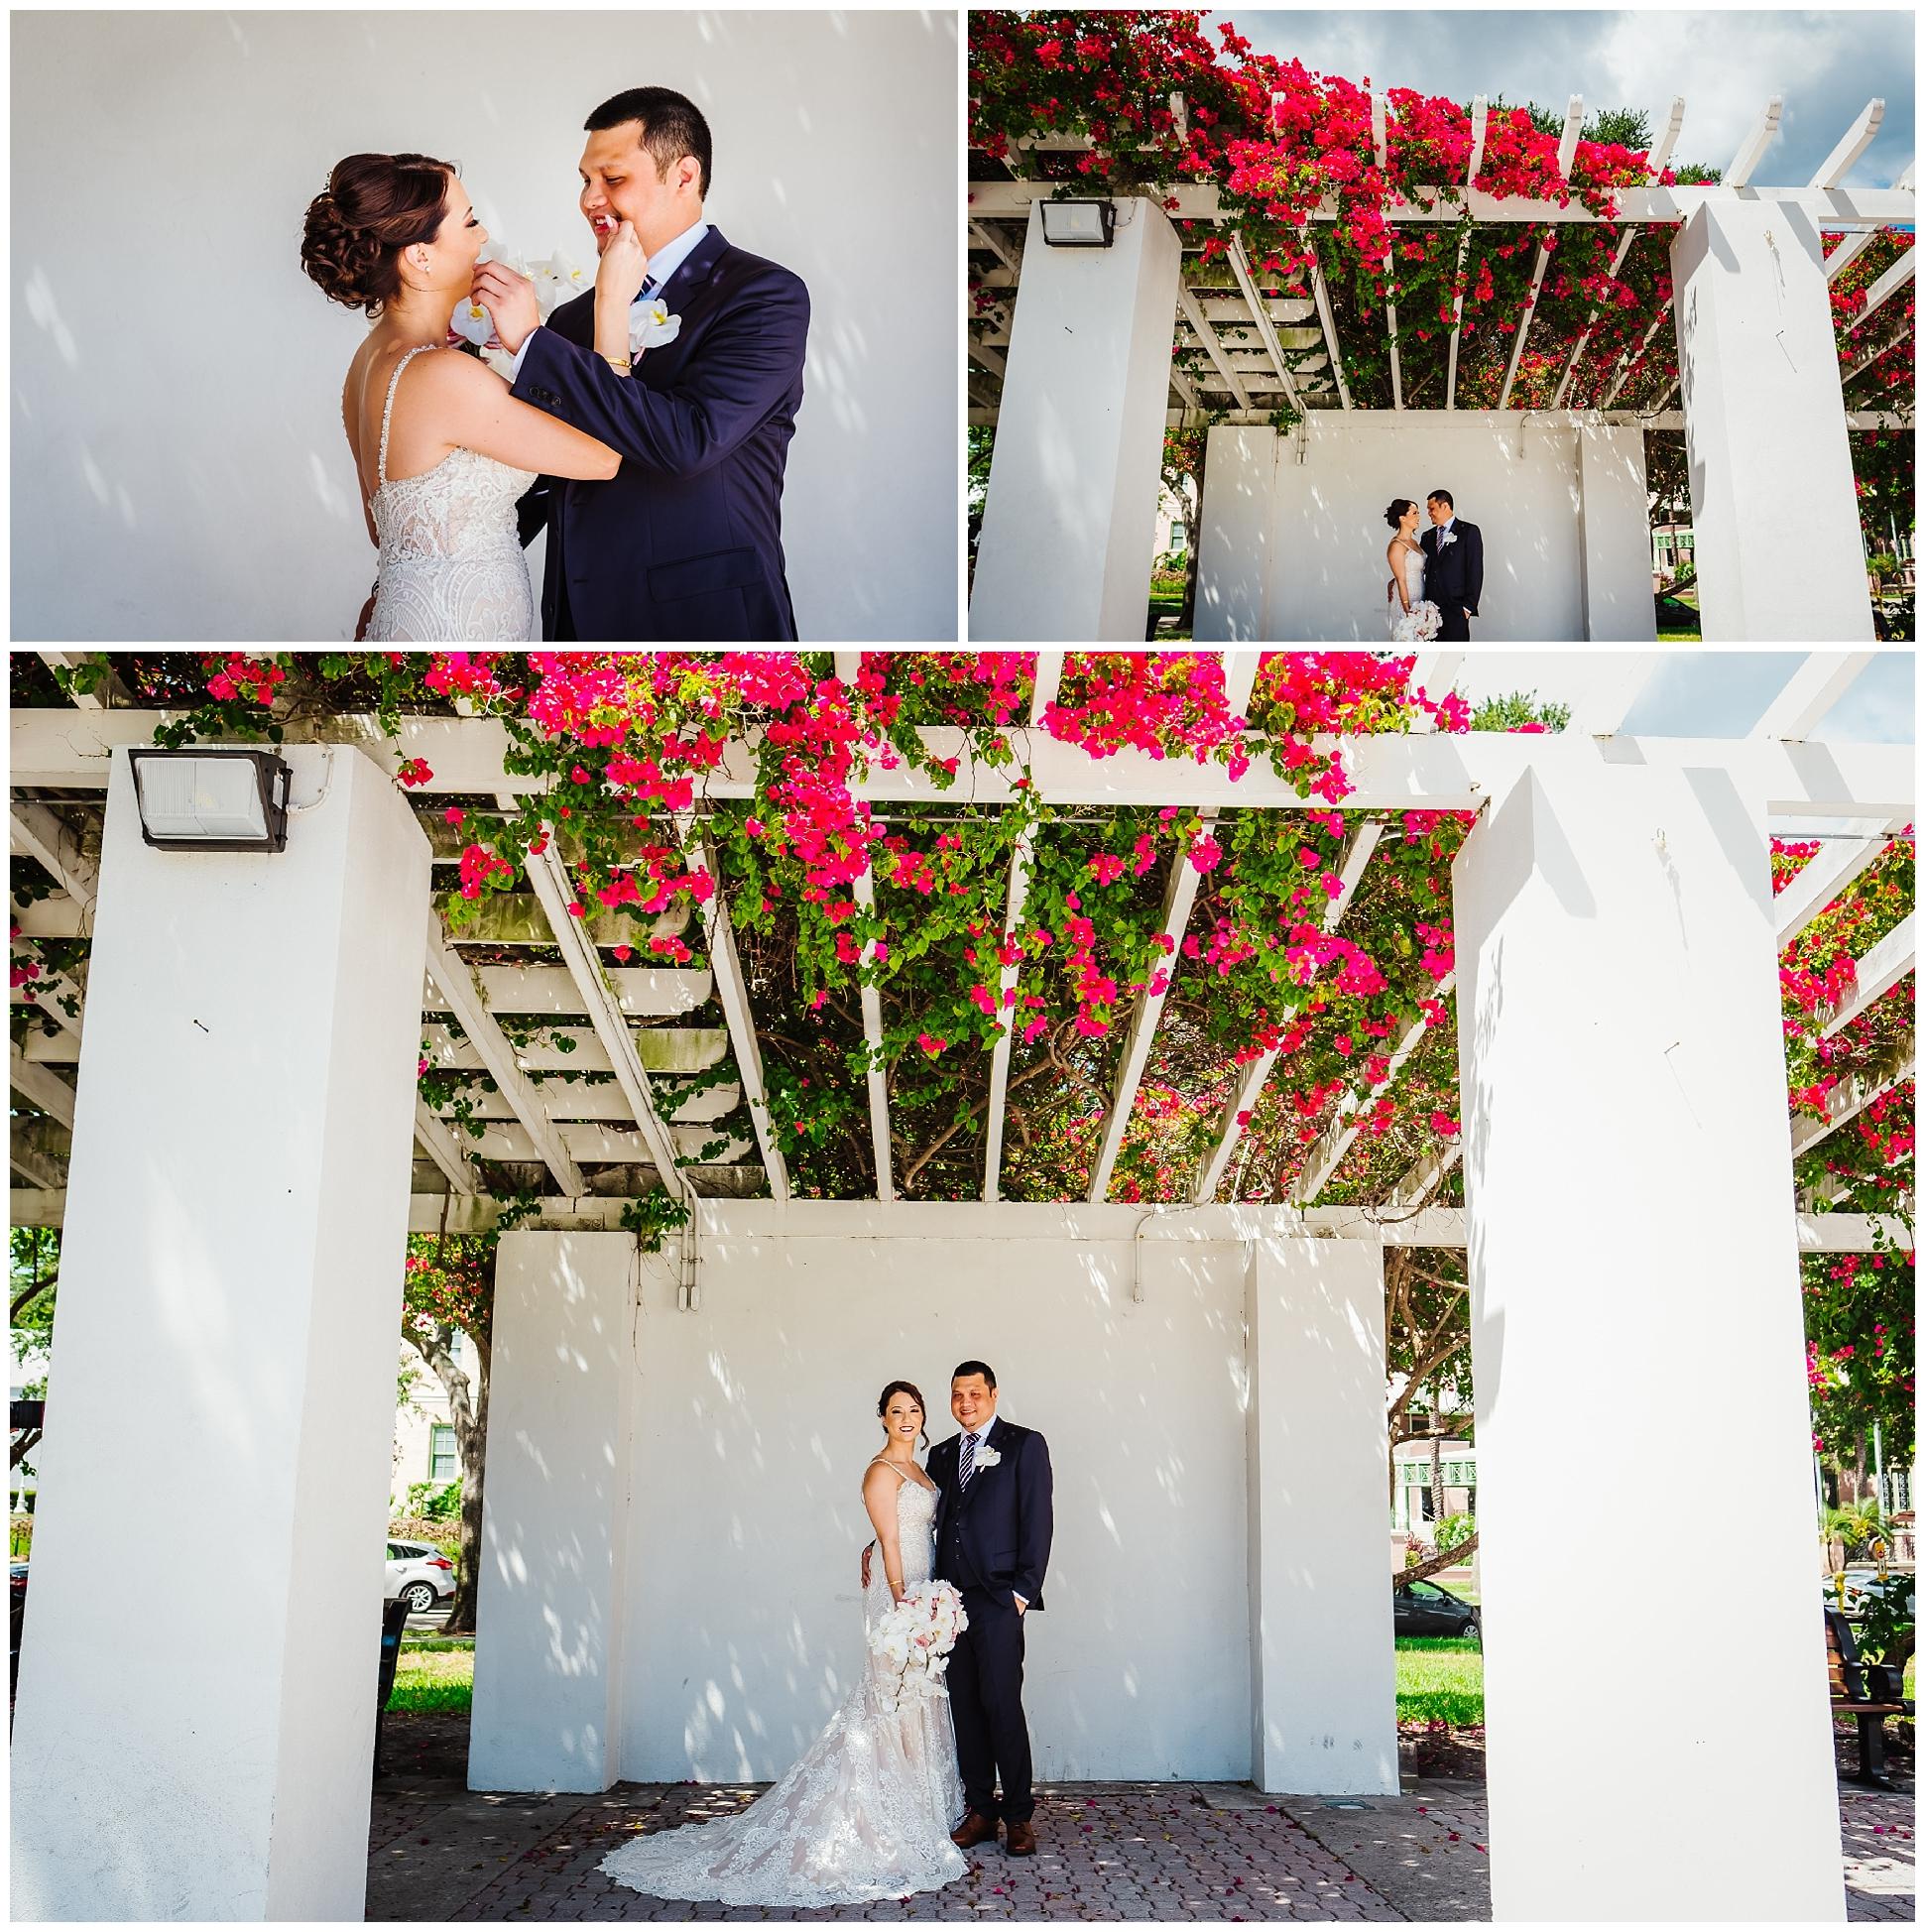 vinoy-sunset-ballroom-rainy-day-wedding-photography-orchids-trinidad-flawless-fetes-ashlee-hamon_0107.jpg